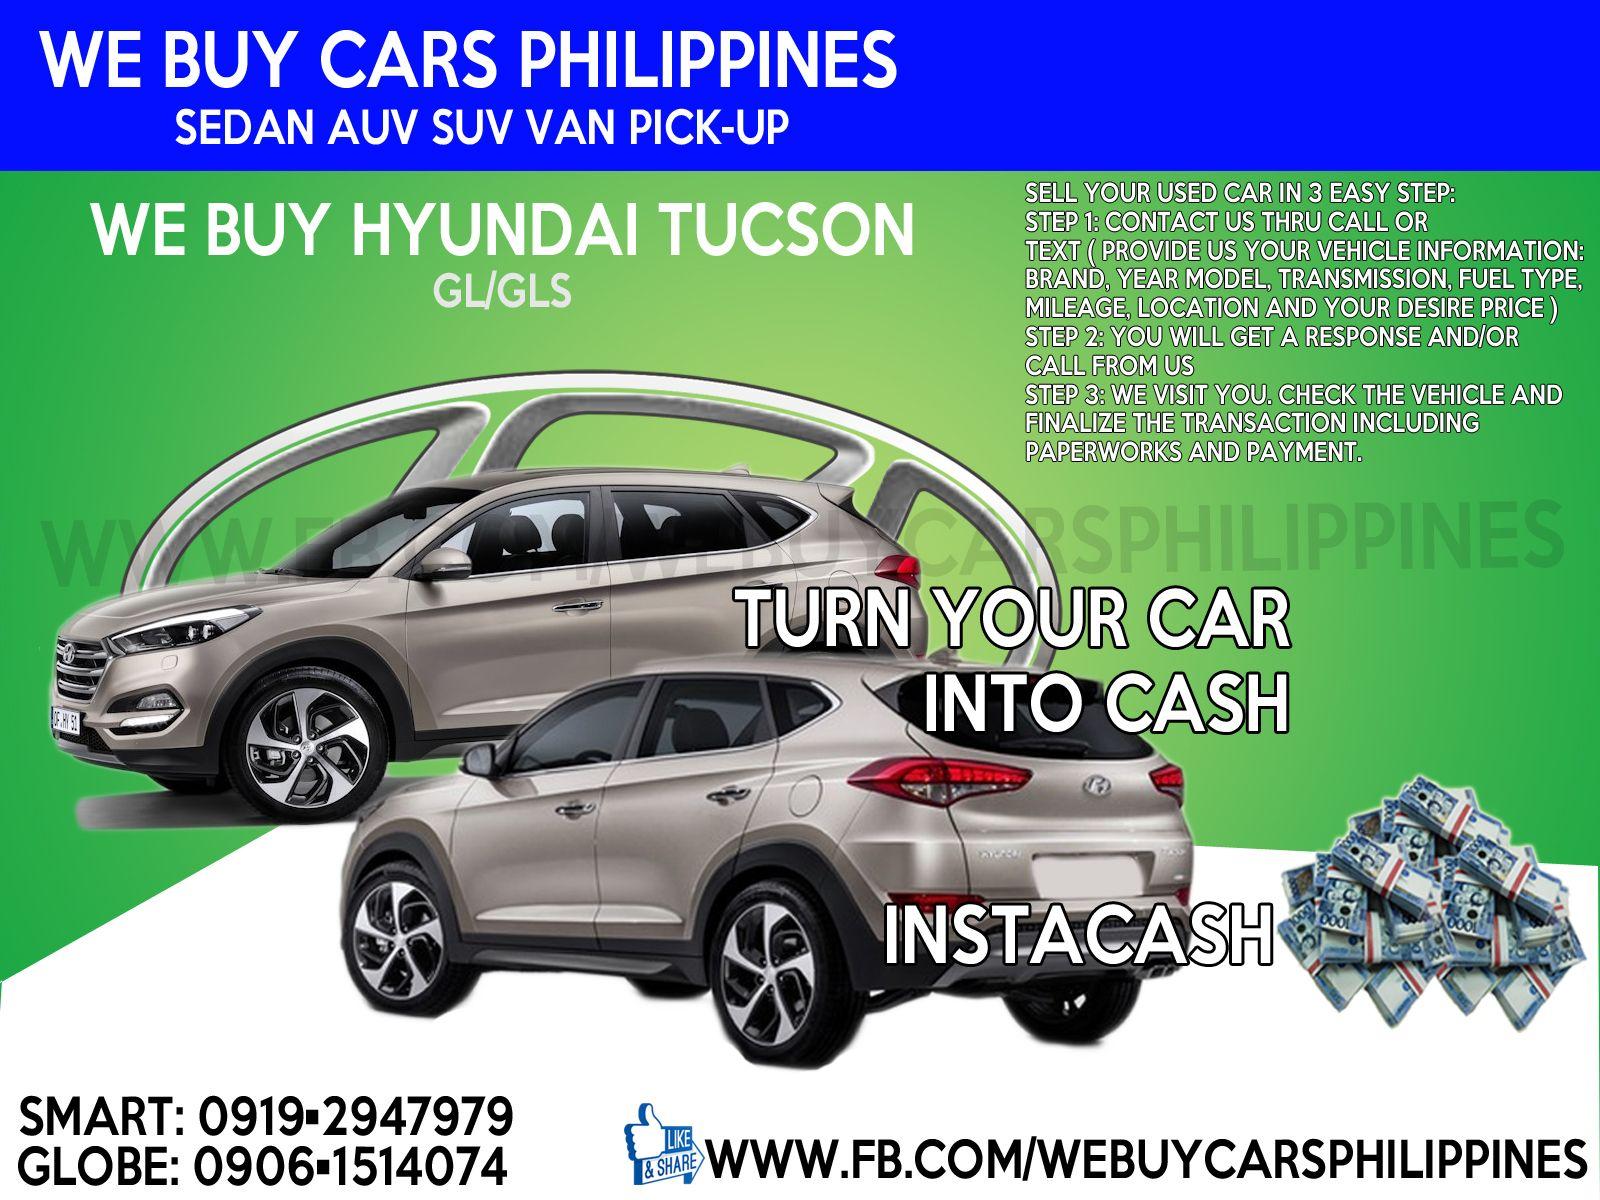 WE BUY USED HYUNDAI TUCSON PHILIPPINES TUCSON GL 6MT FWD FL TUCSON ...